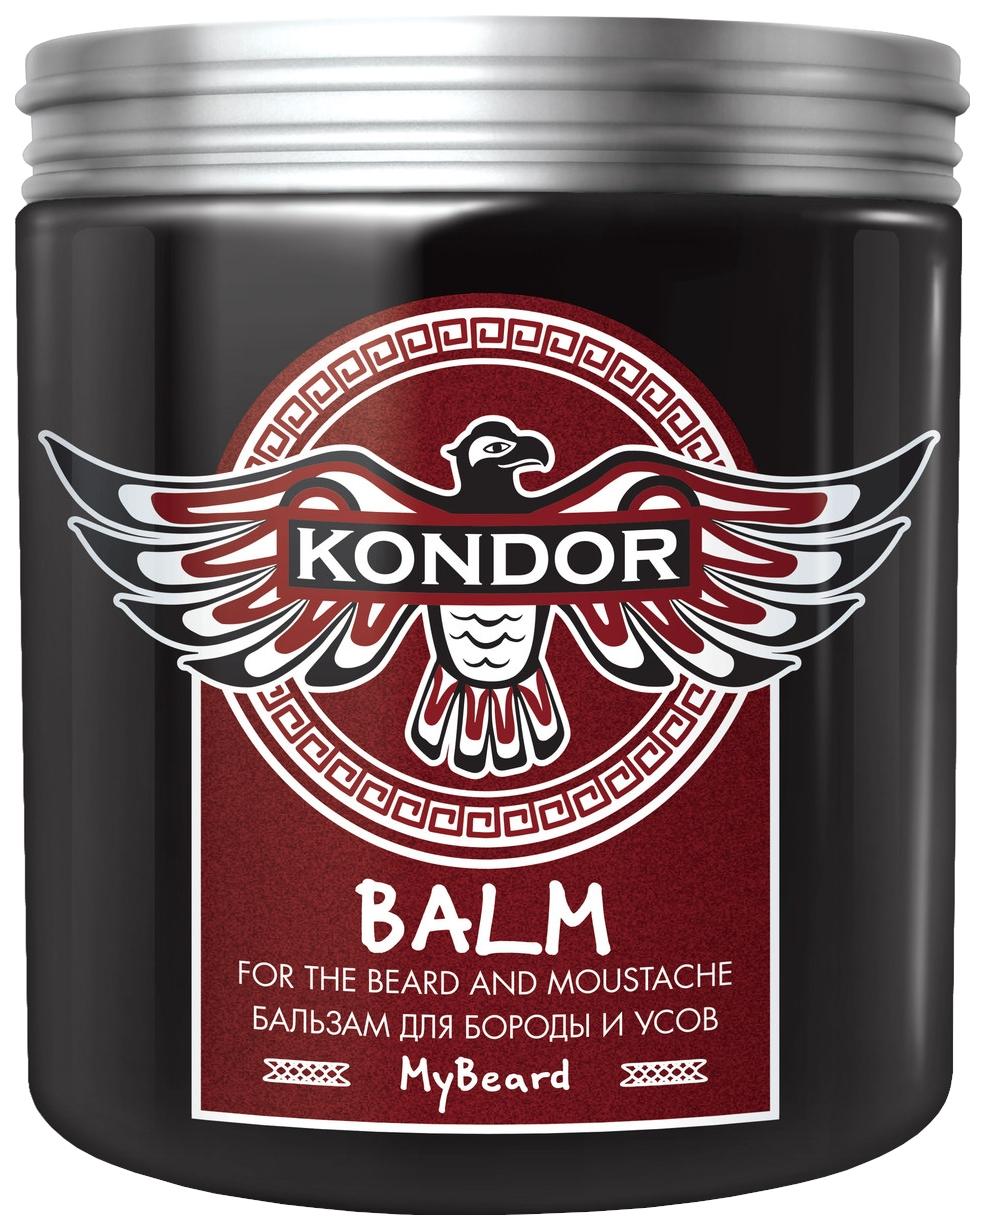 Бальзам для бороды Kondor Balm For